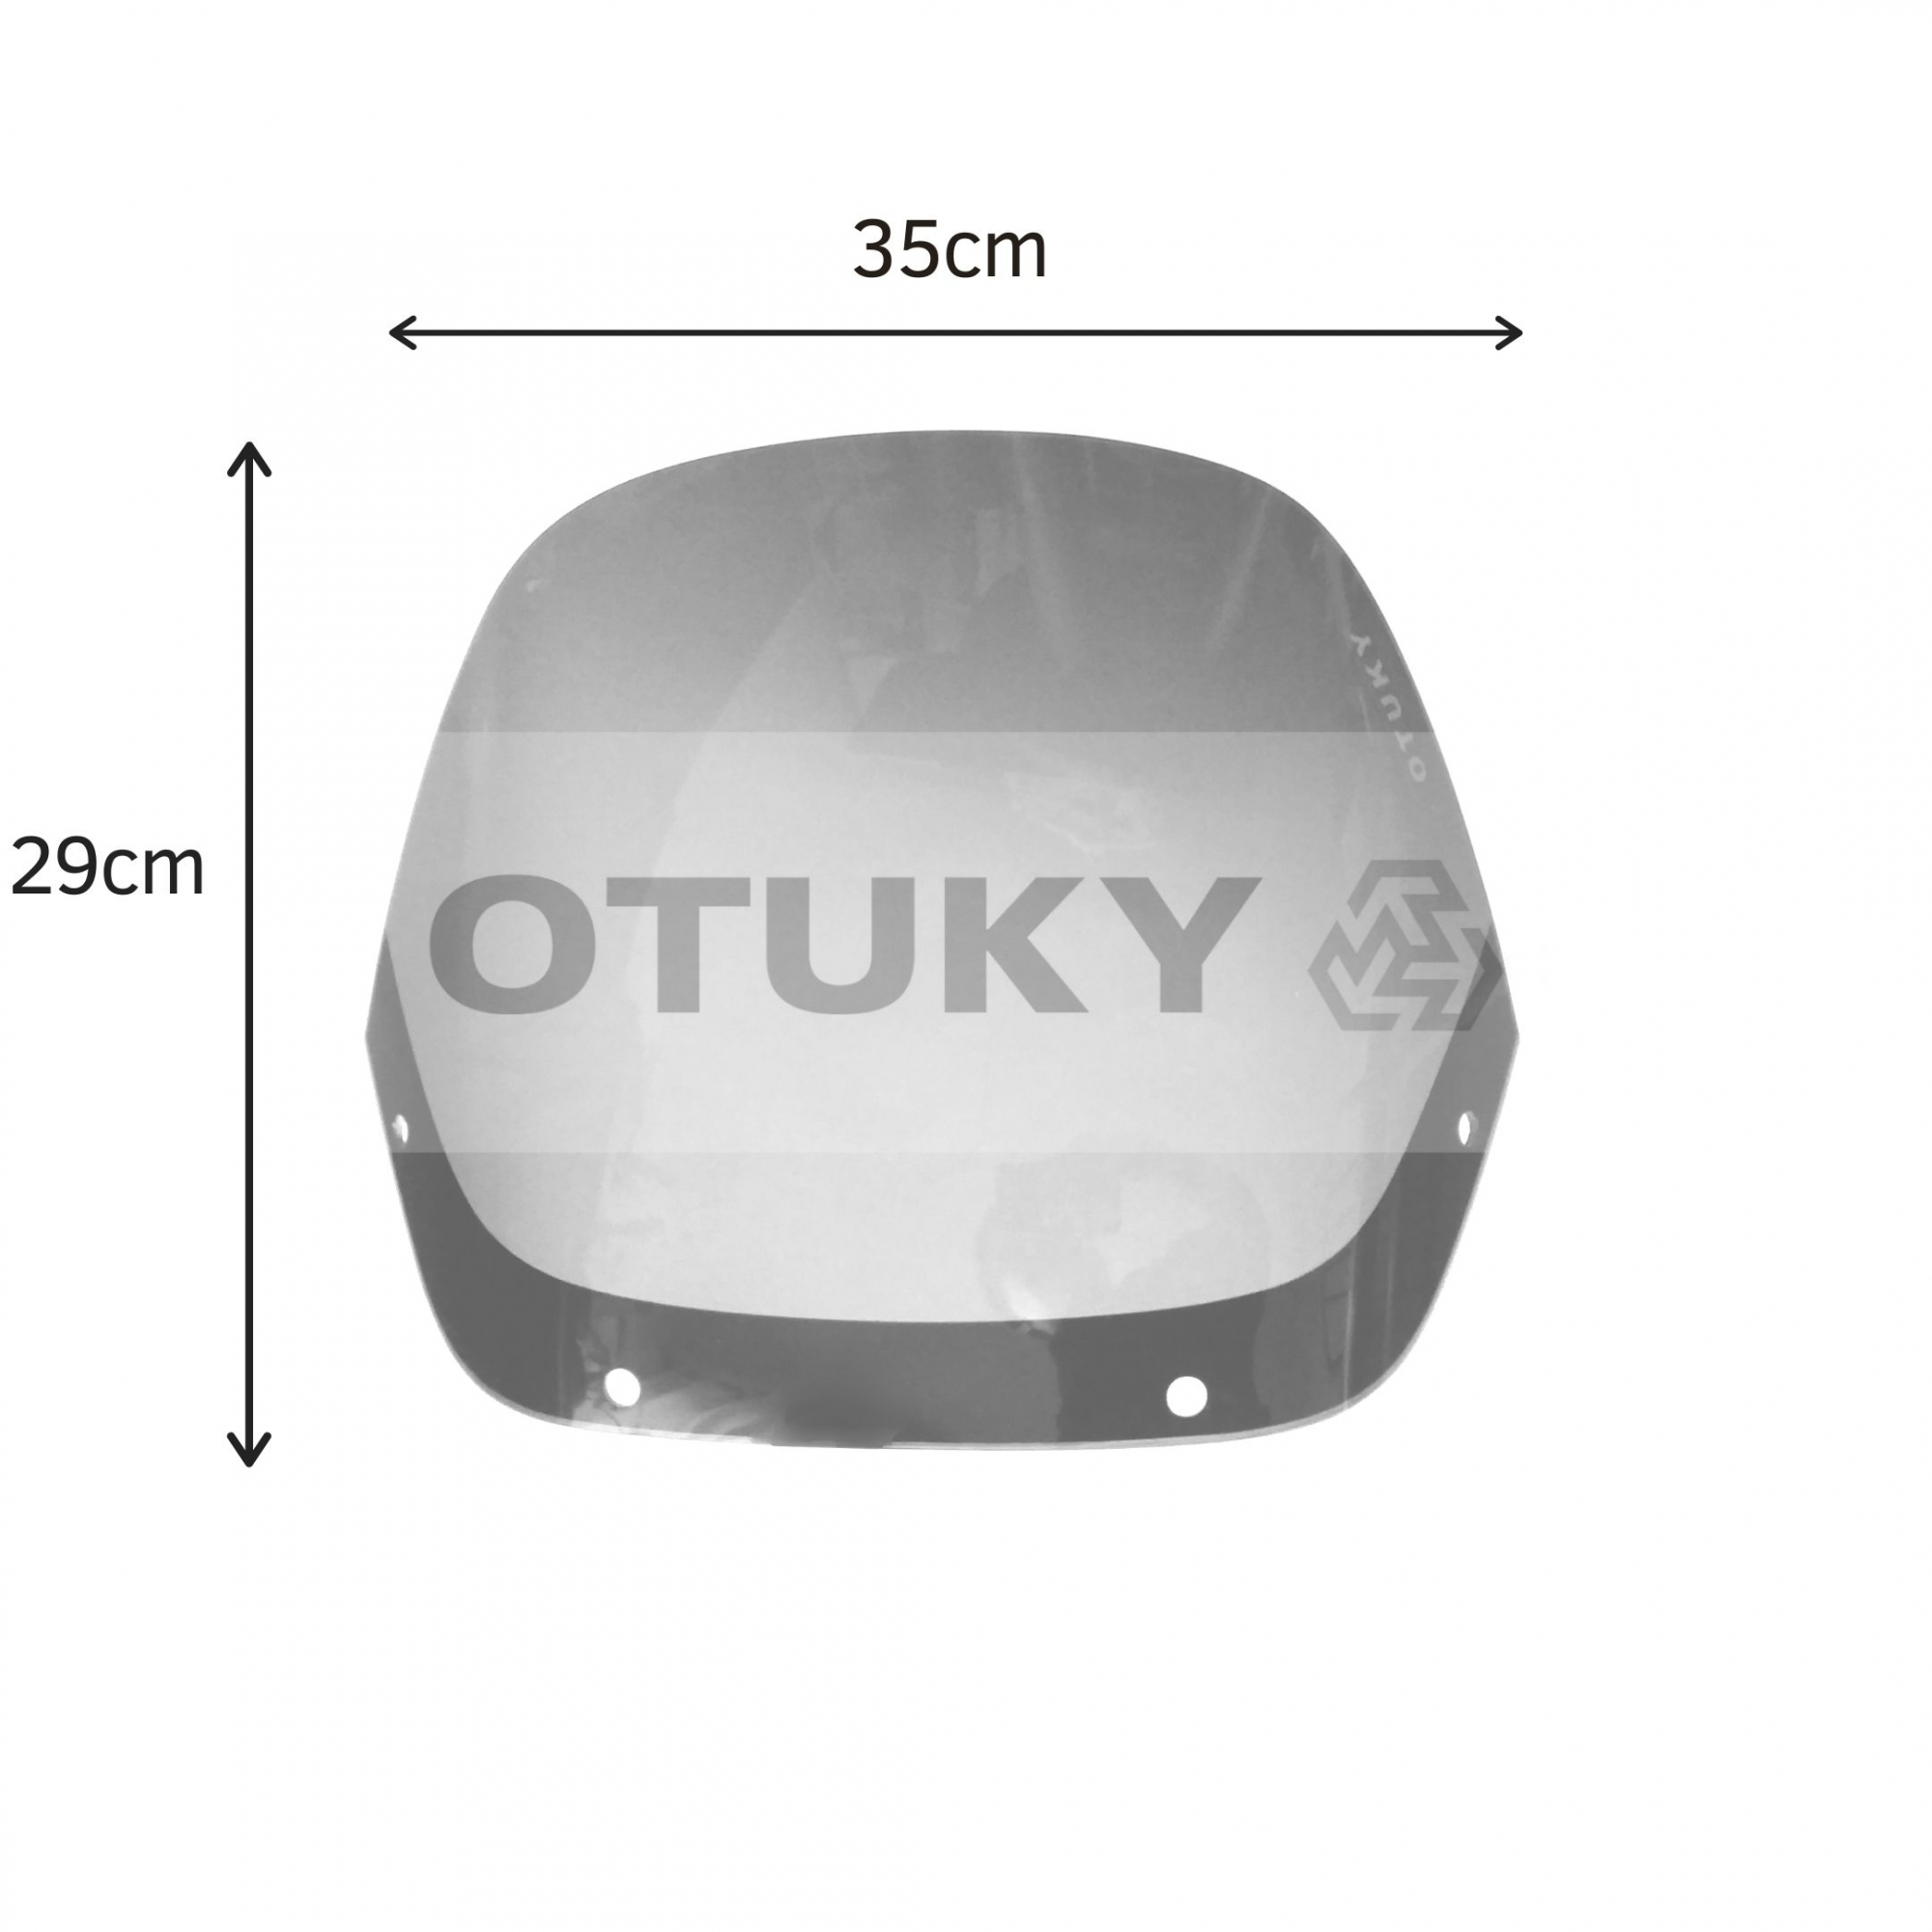 Bolha para Moto NX 350 Sahara Tamanho Padrão Otuky Fumê Cinza